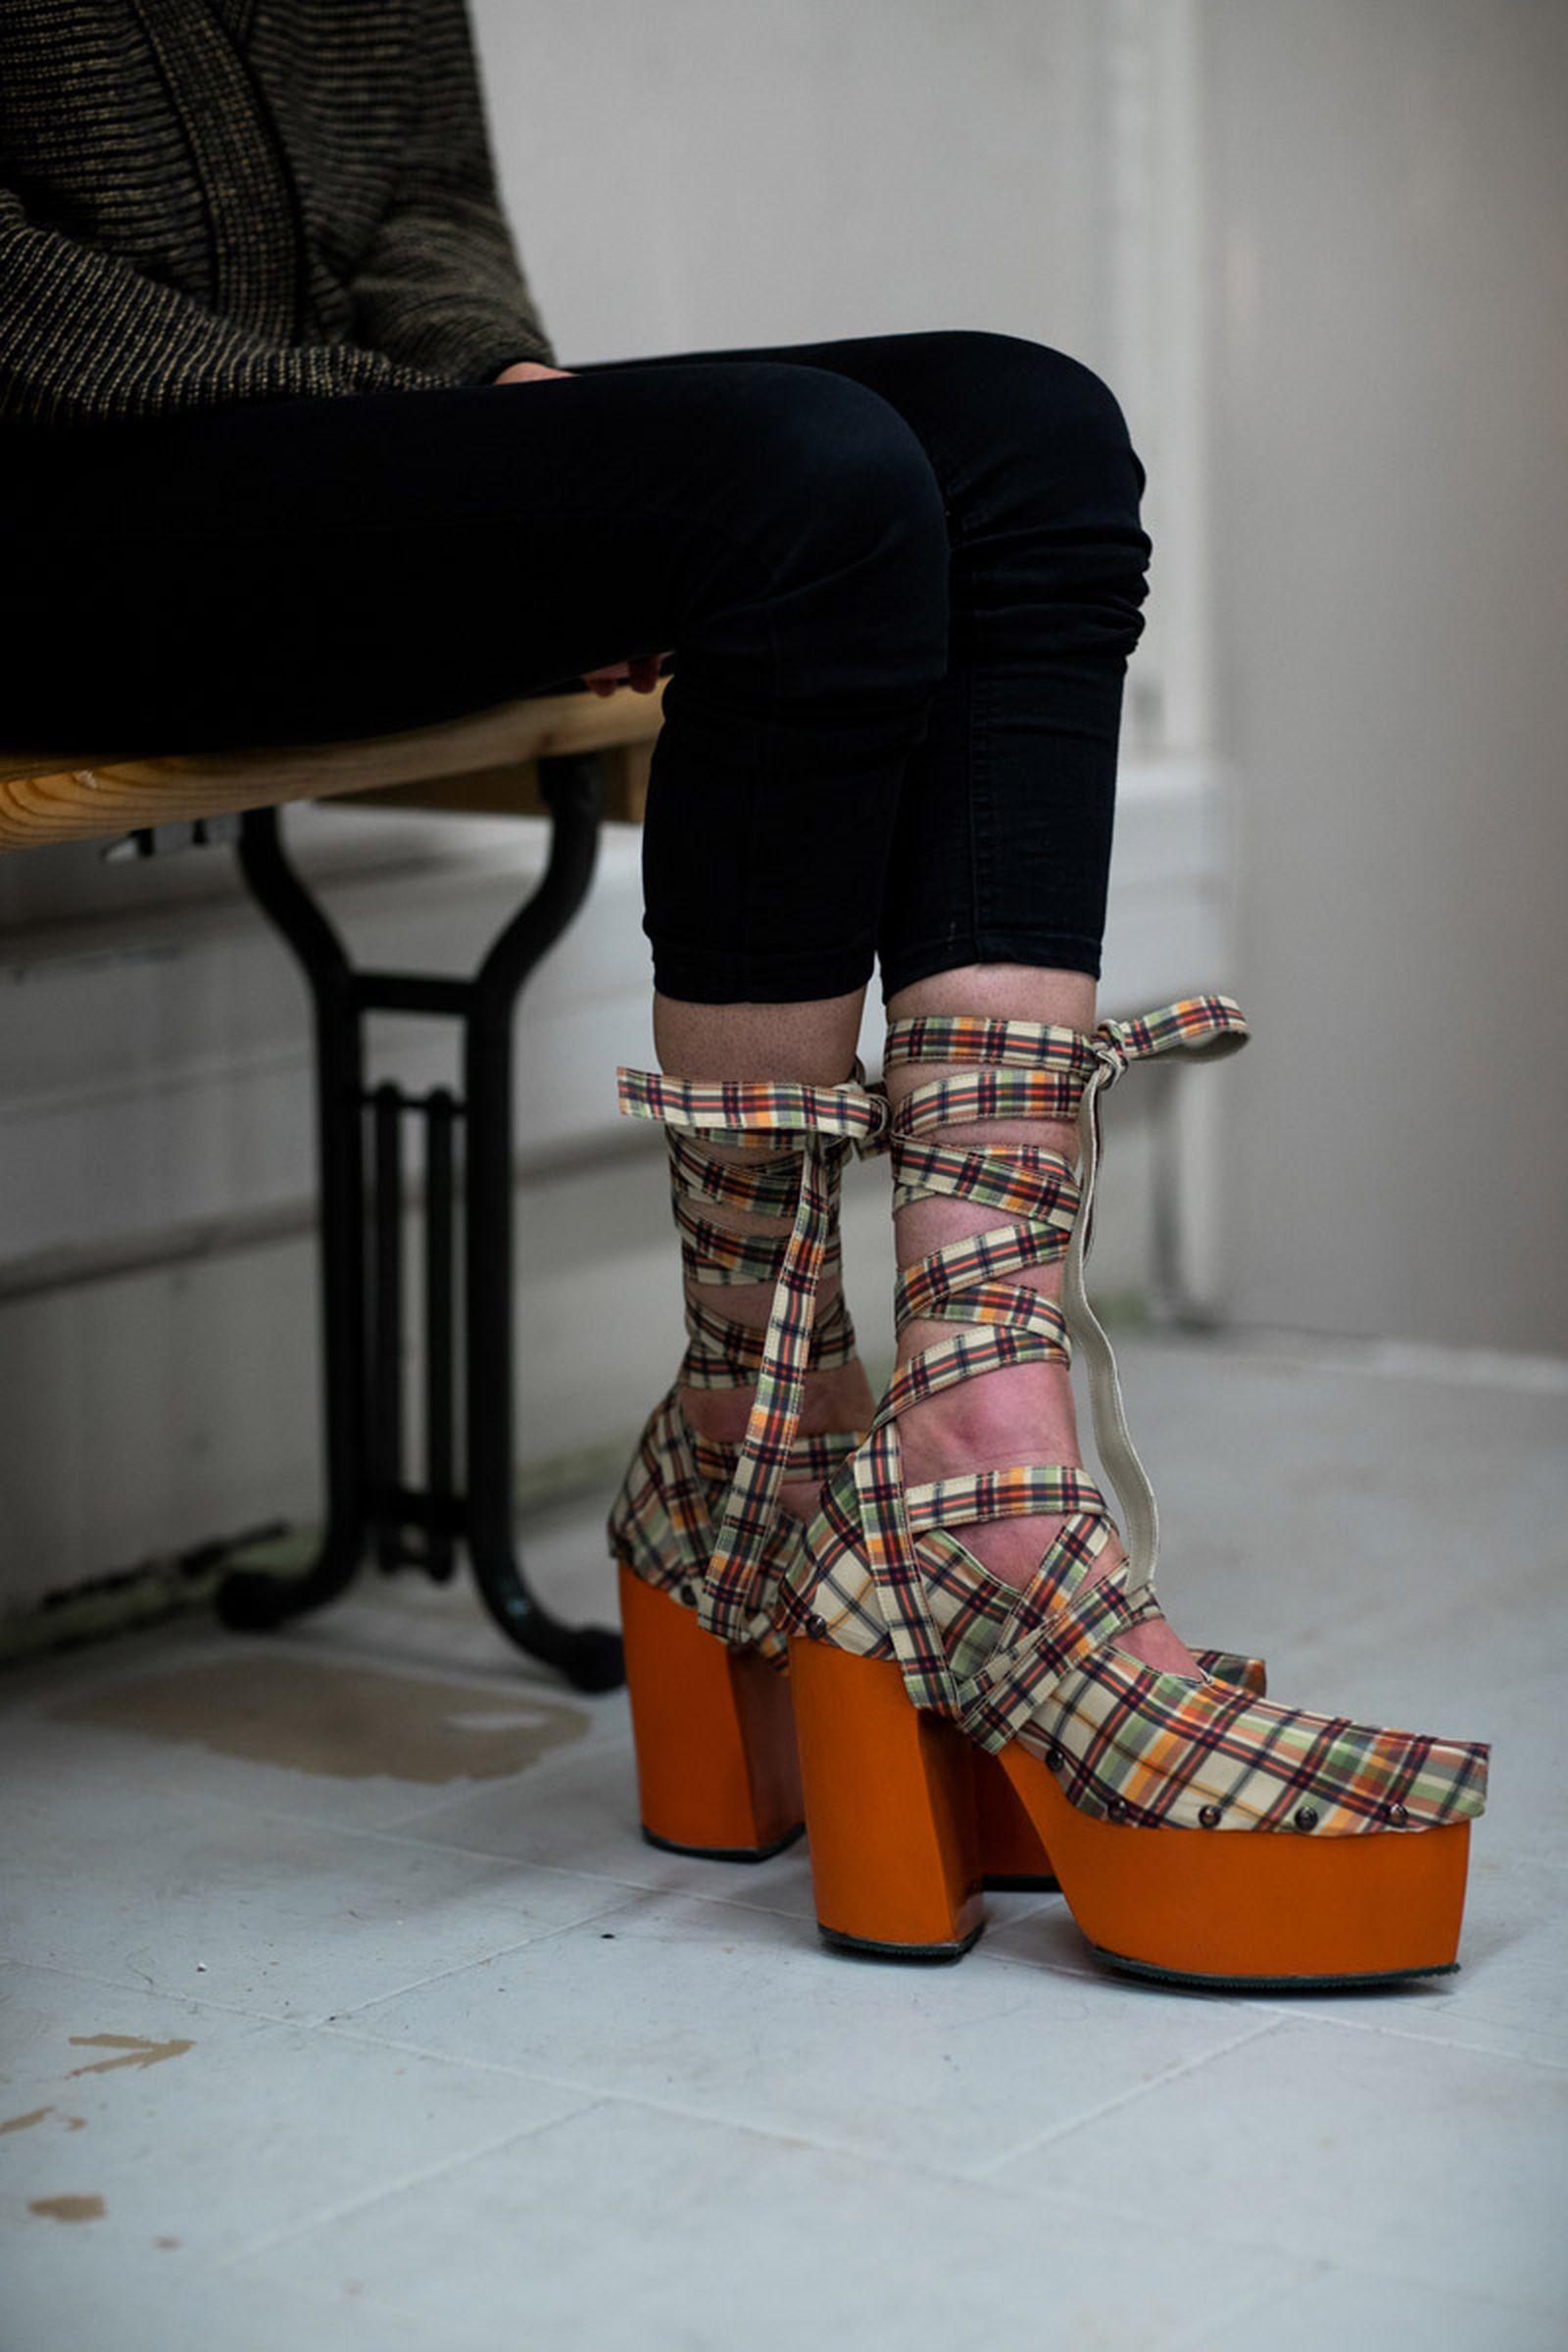 ddp neith nyer fw19 pfw Francisco Terra Paris Fashion Week Women's